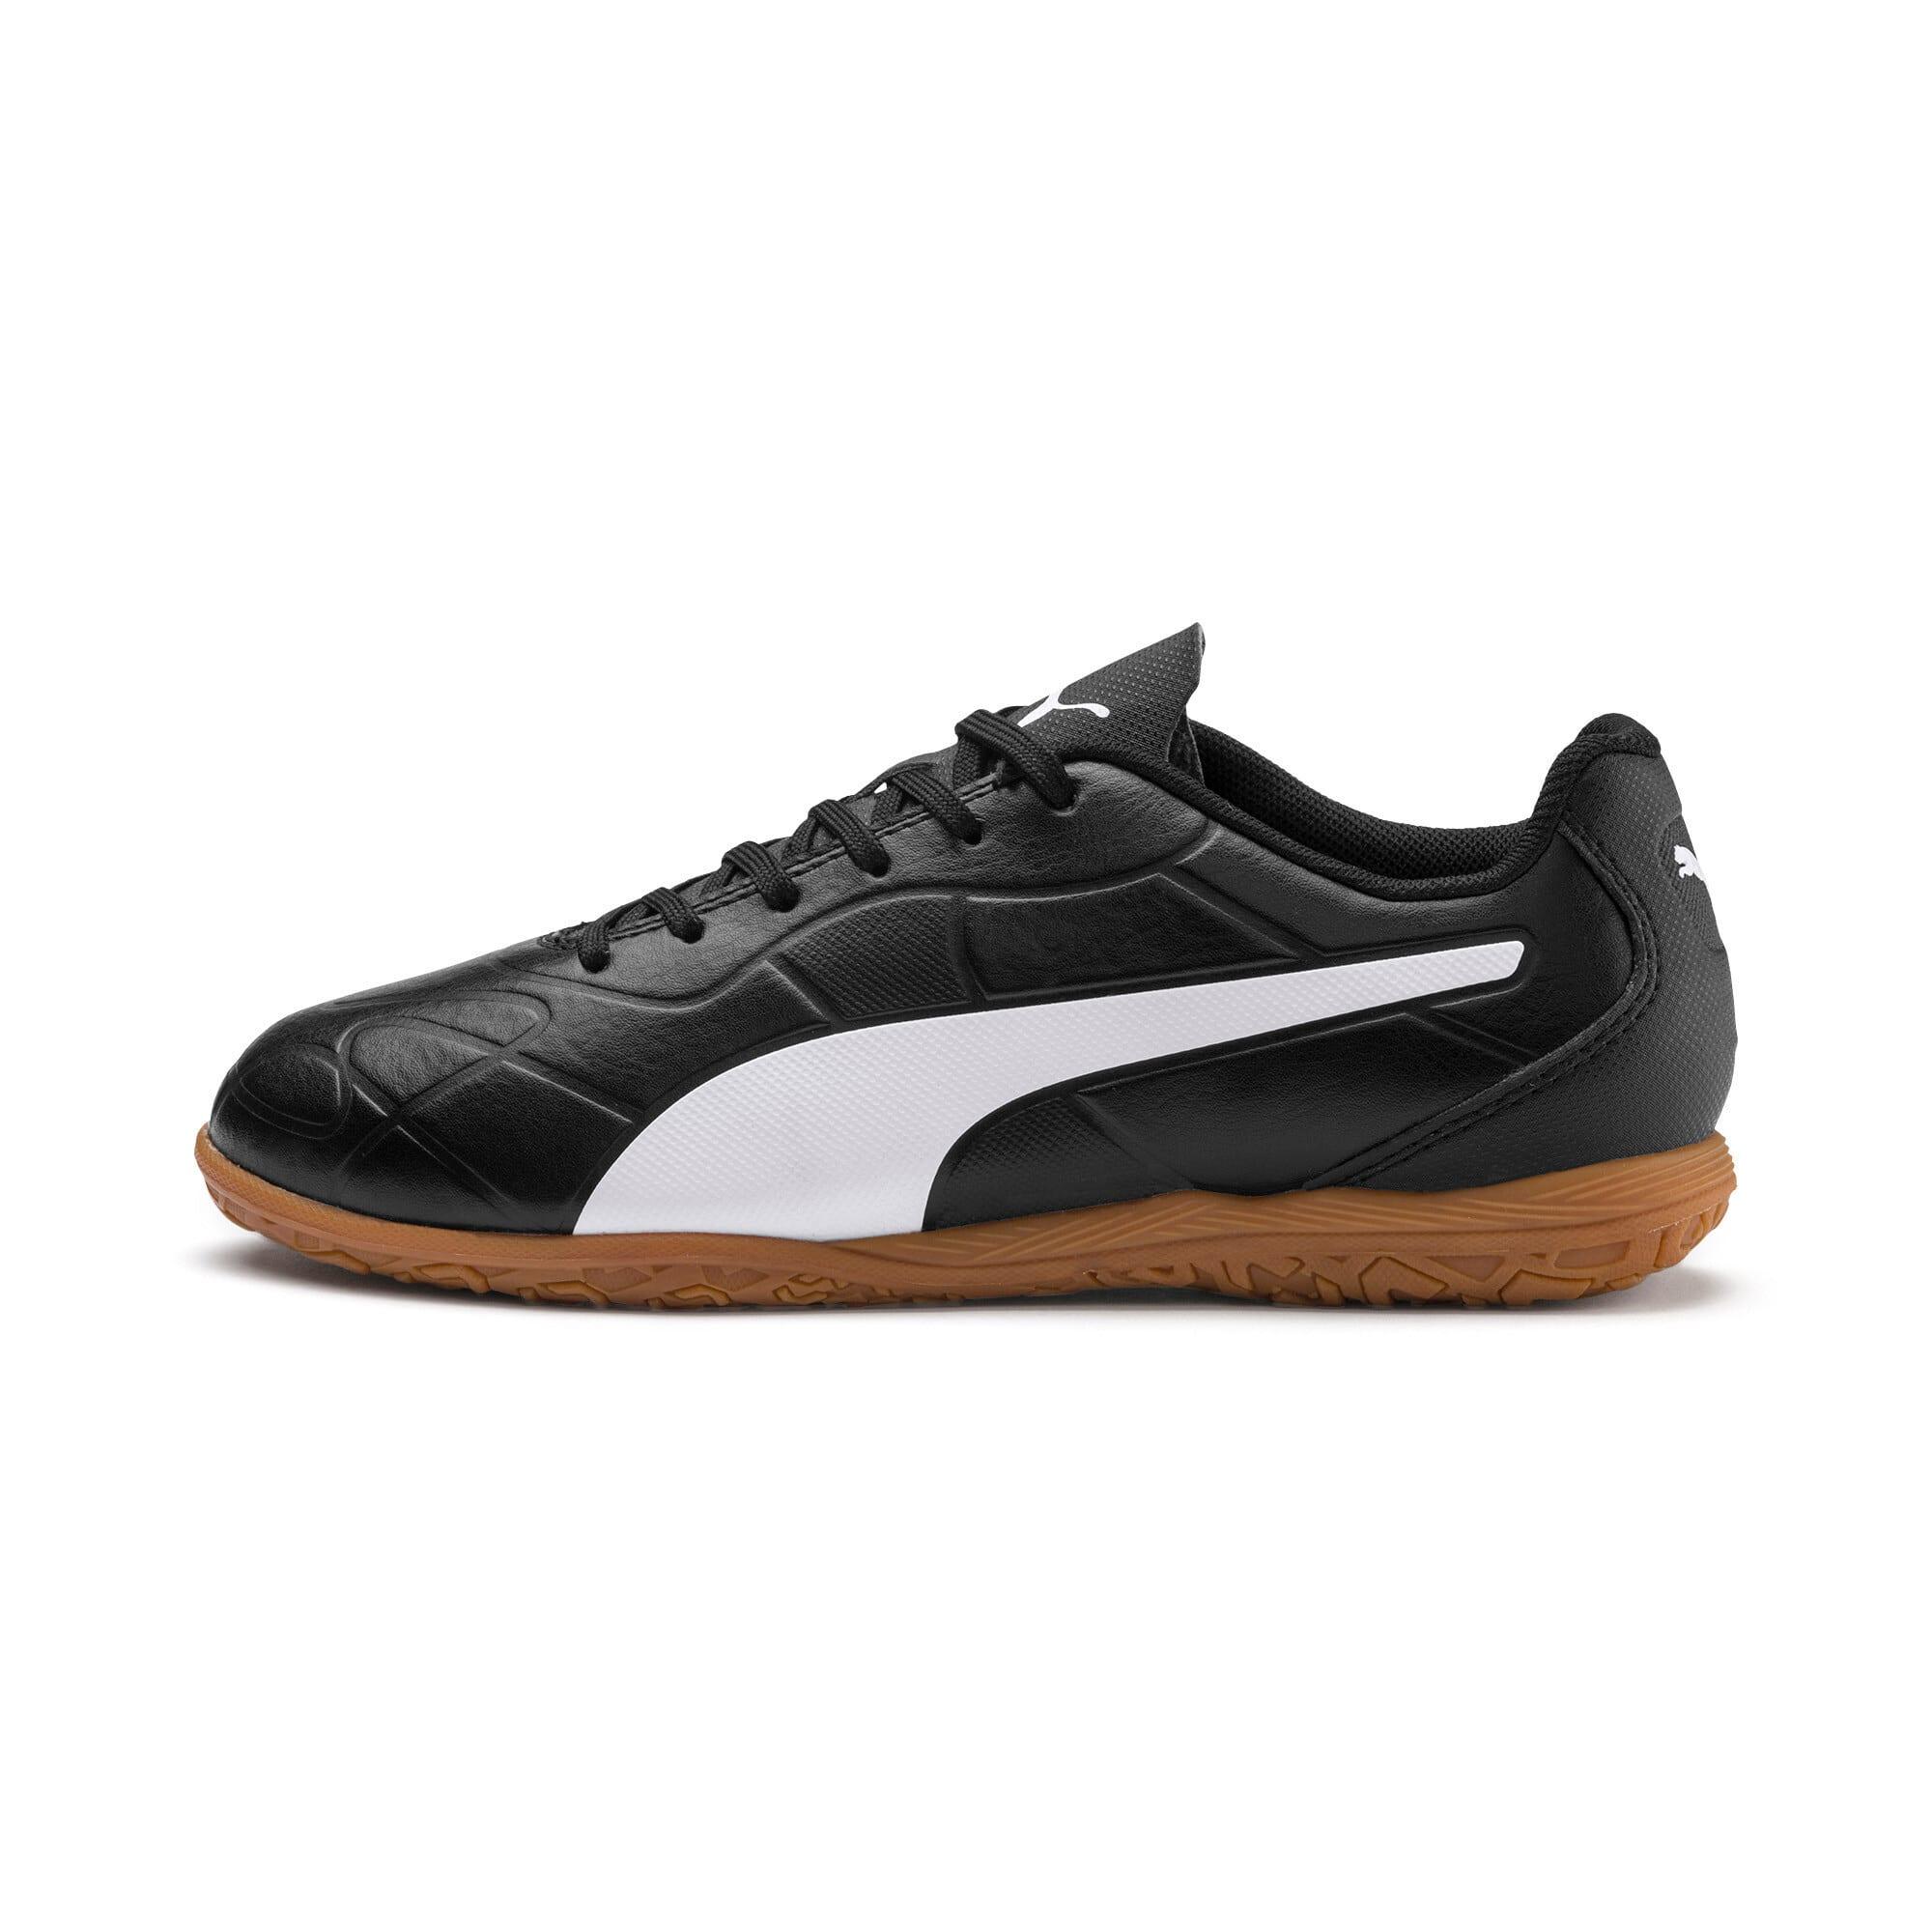 Thumbnail 1 of Monarch IT Youth Football Boot, Puma Black-Puma White, medium-IND